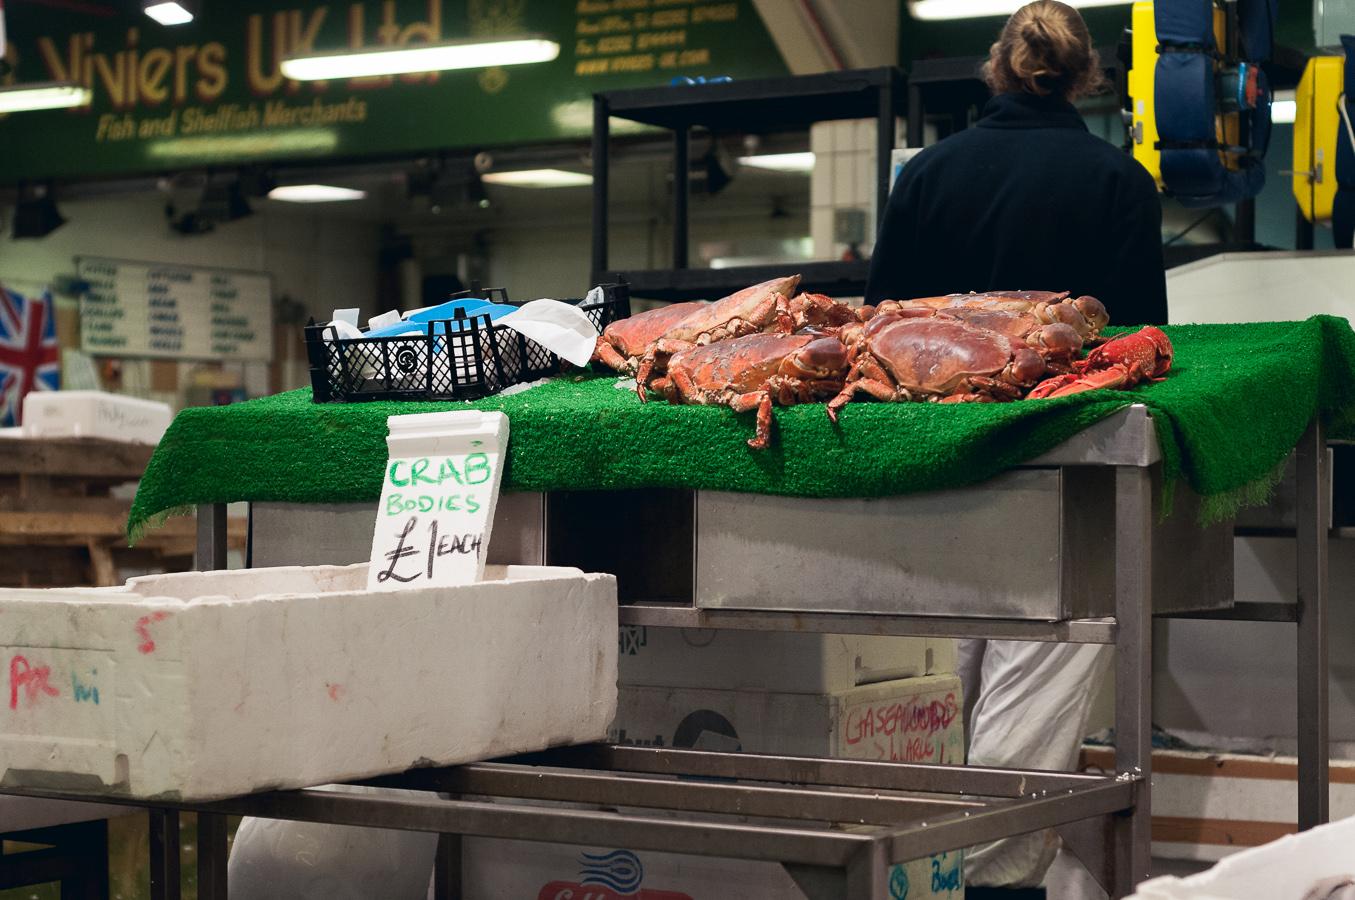 billings-gate-market-hard-shell-crab-bodies.jpg